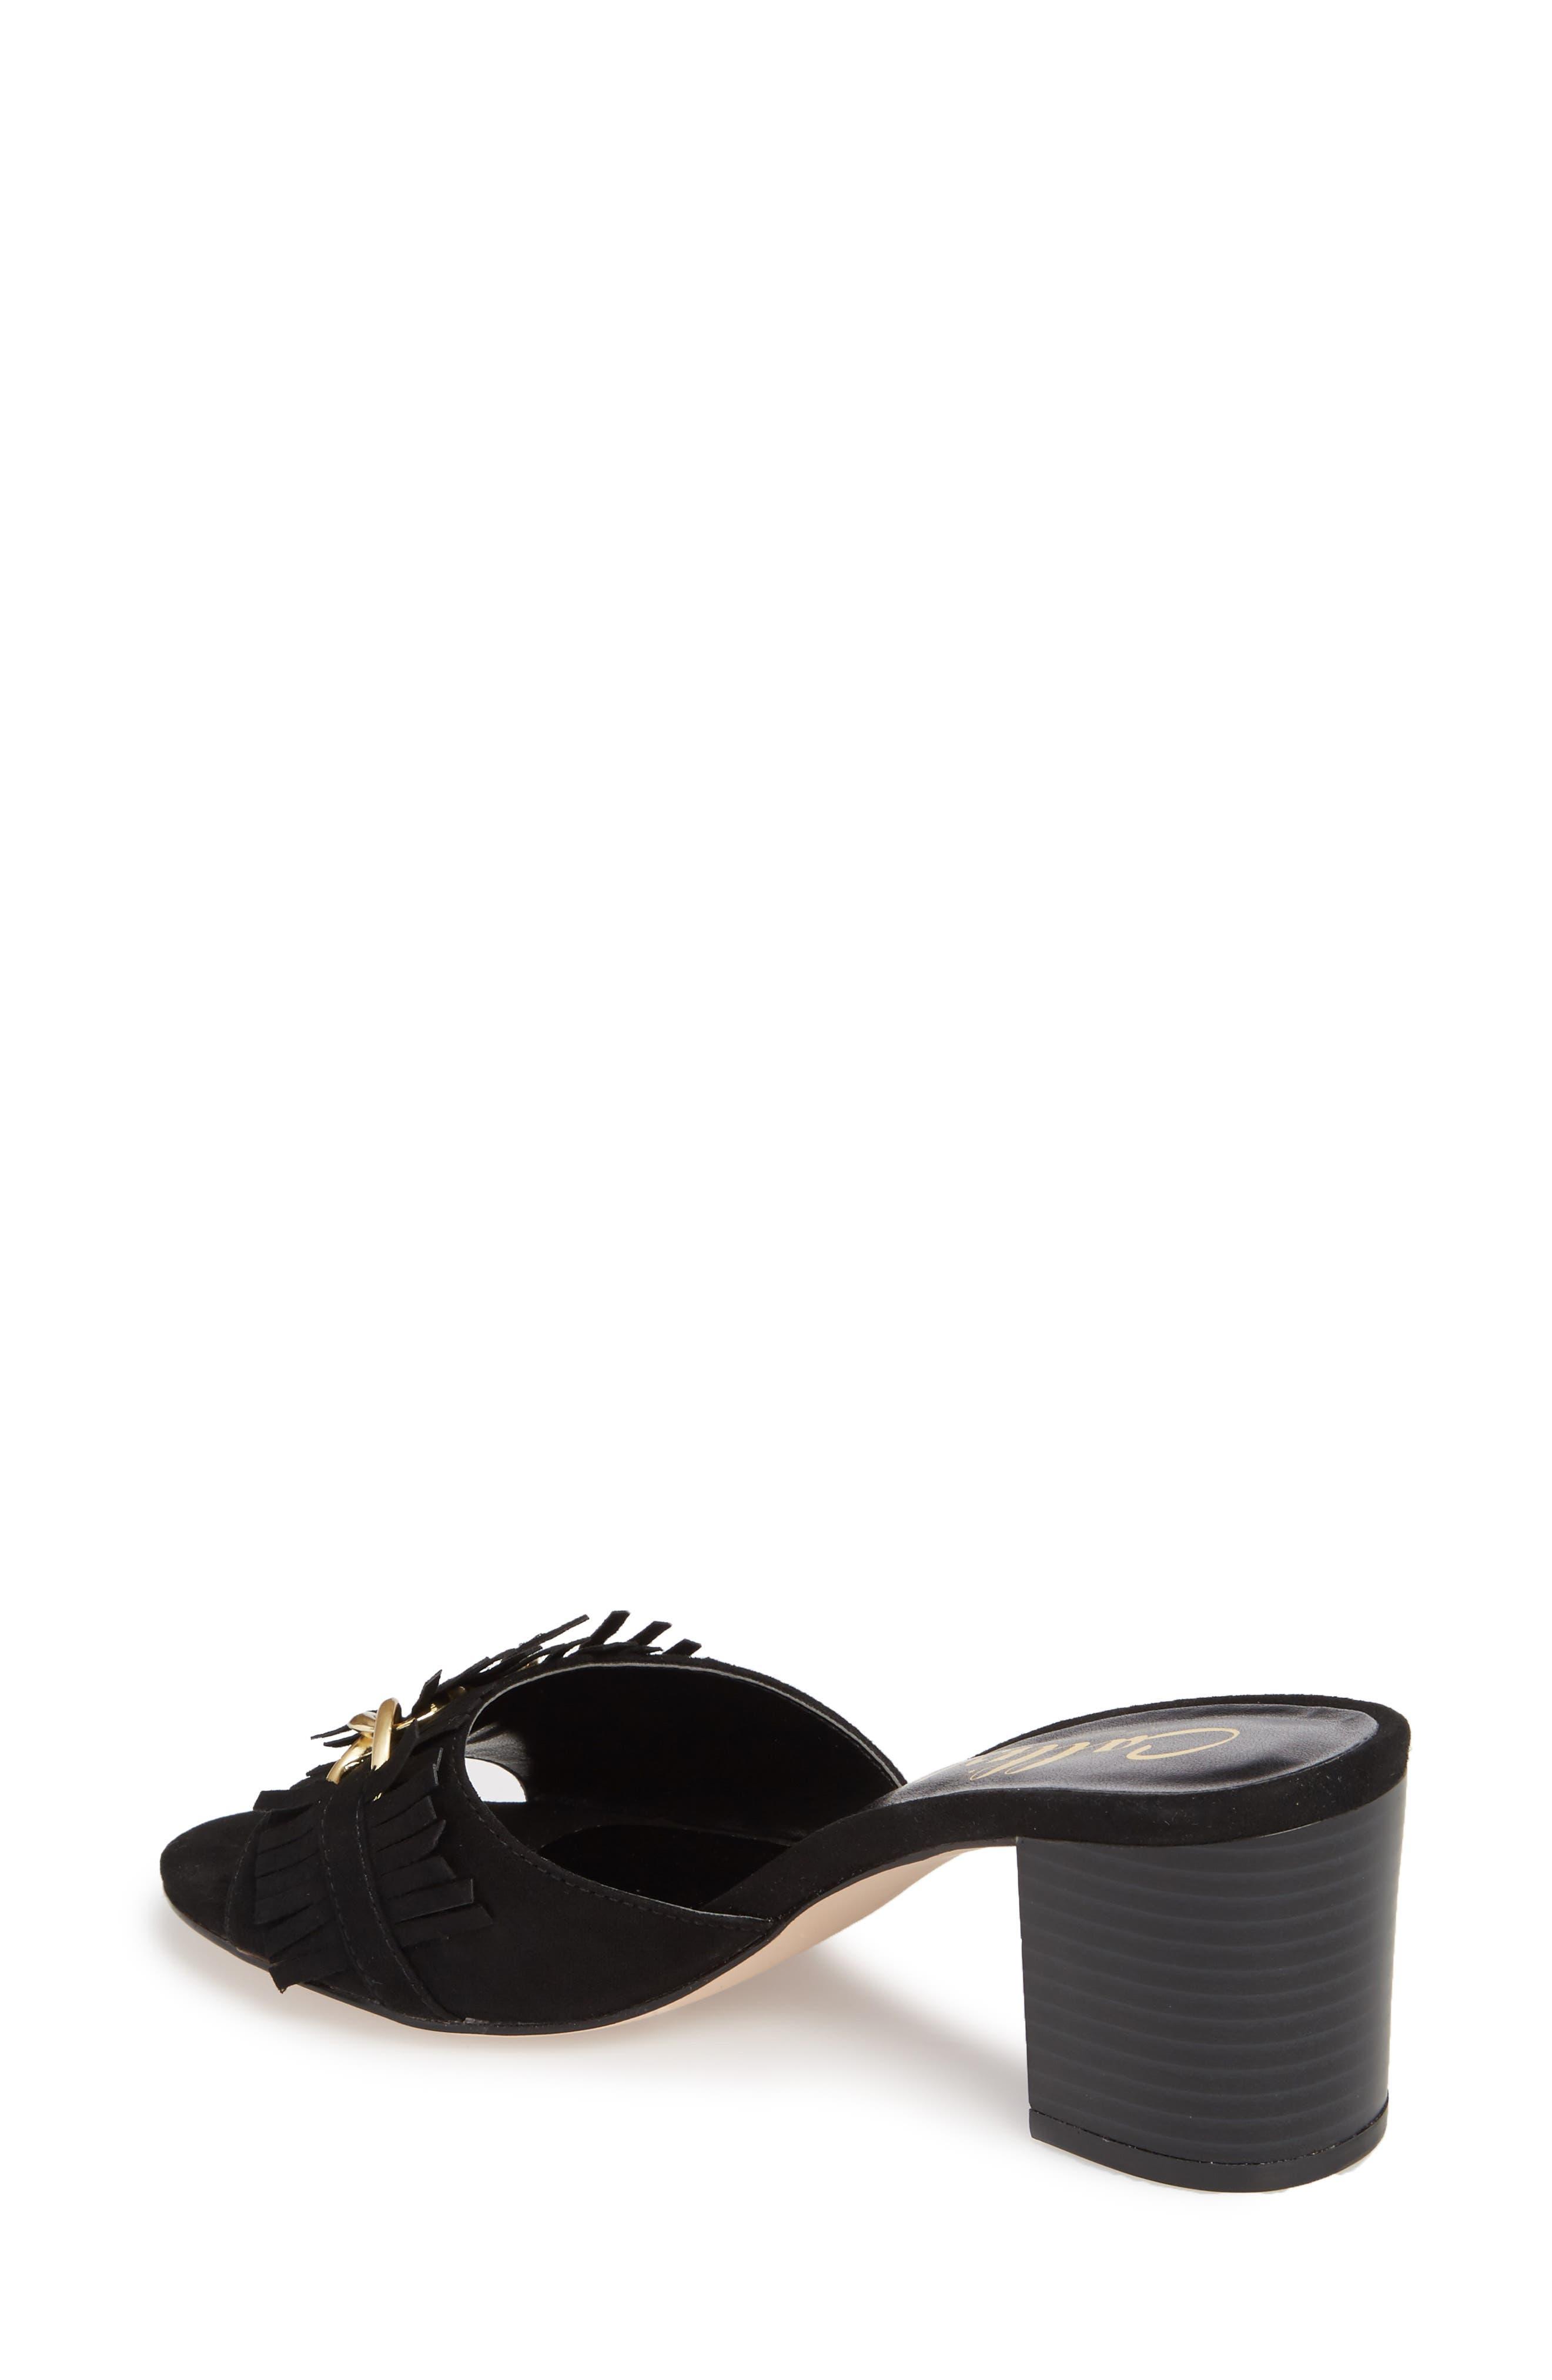 Zinnia Block Heel Slide Sandal,                             Alternate thumbnail 2, color,                             BLACK SUEDE